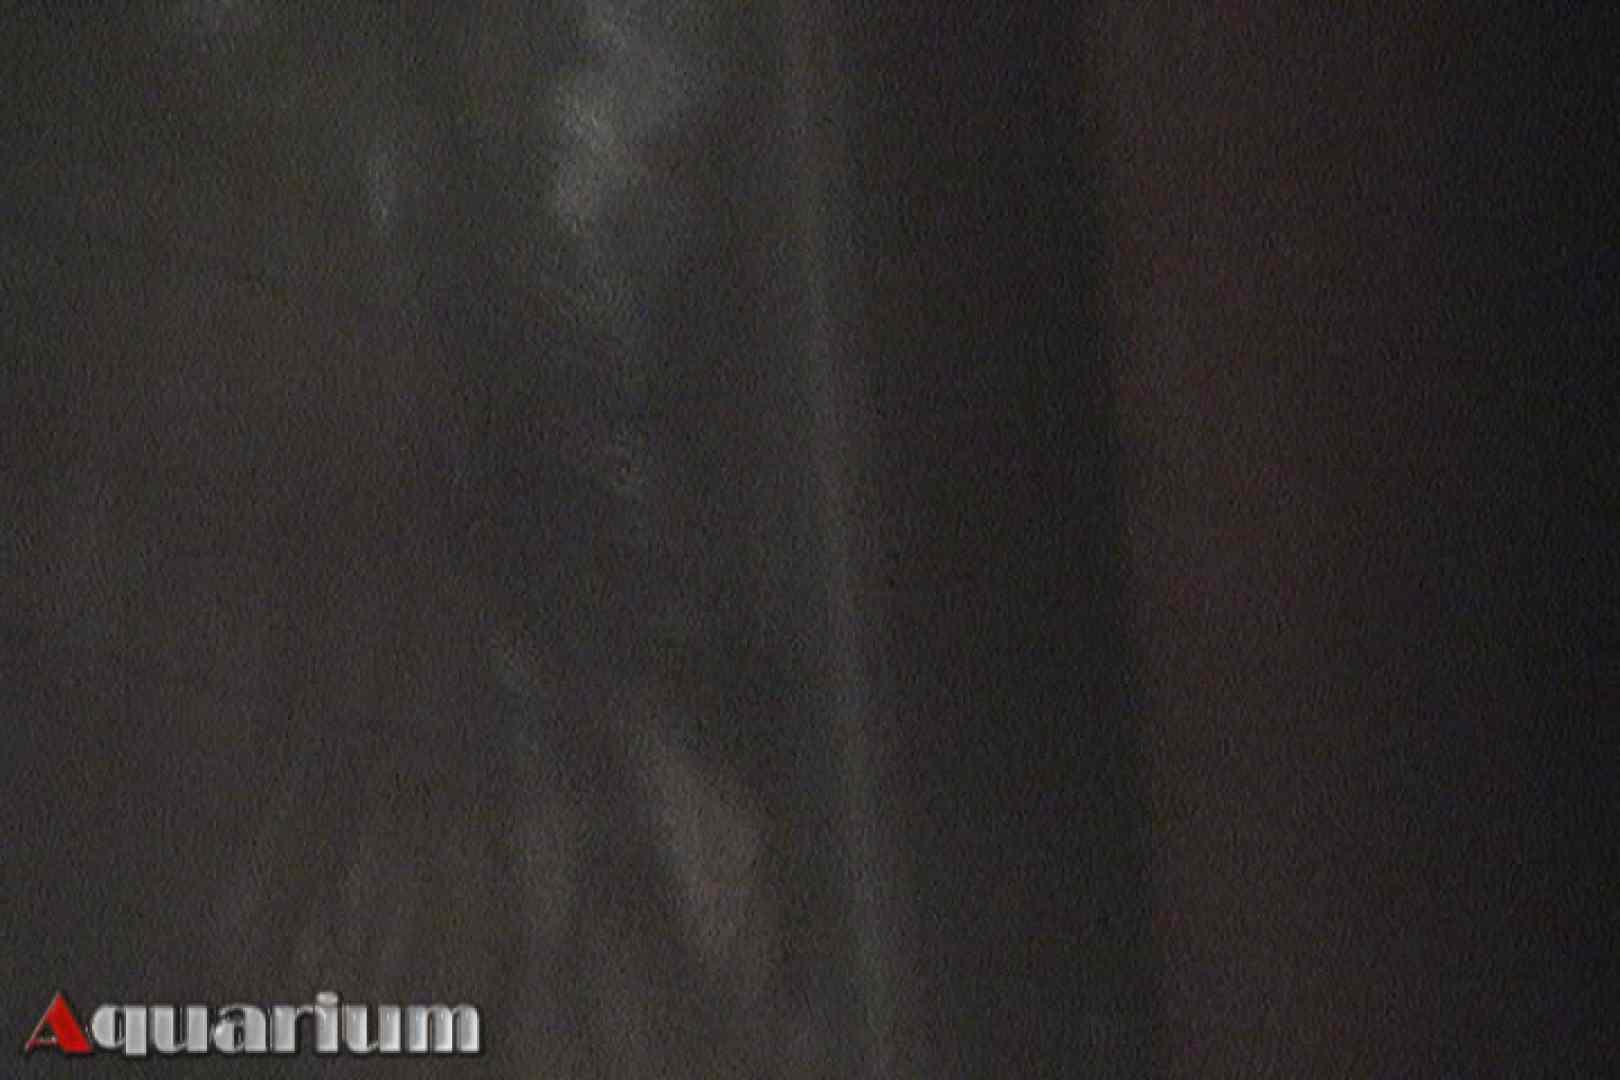 旅館脱衣所お着替え盗撮 Vol.01 OL | 脱衣所  78連発 59